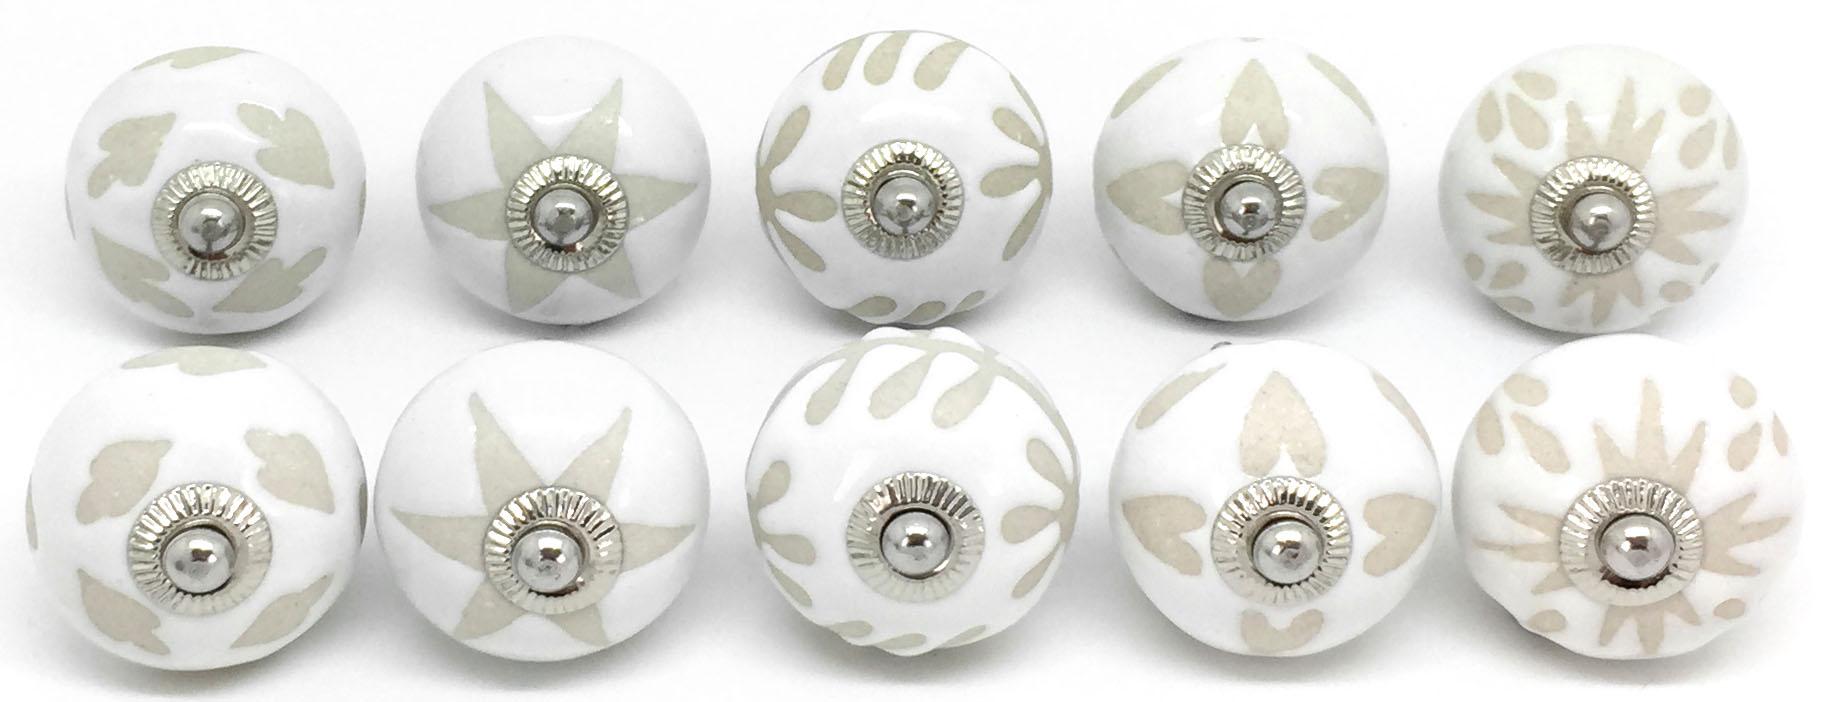 FP70 Set of 10 Mixed White & Cream